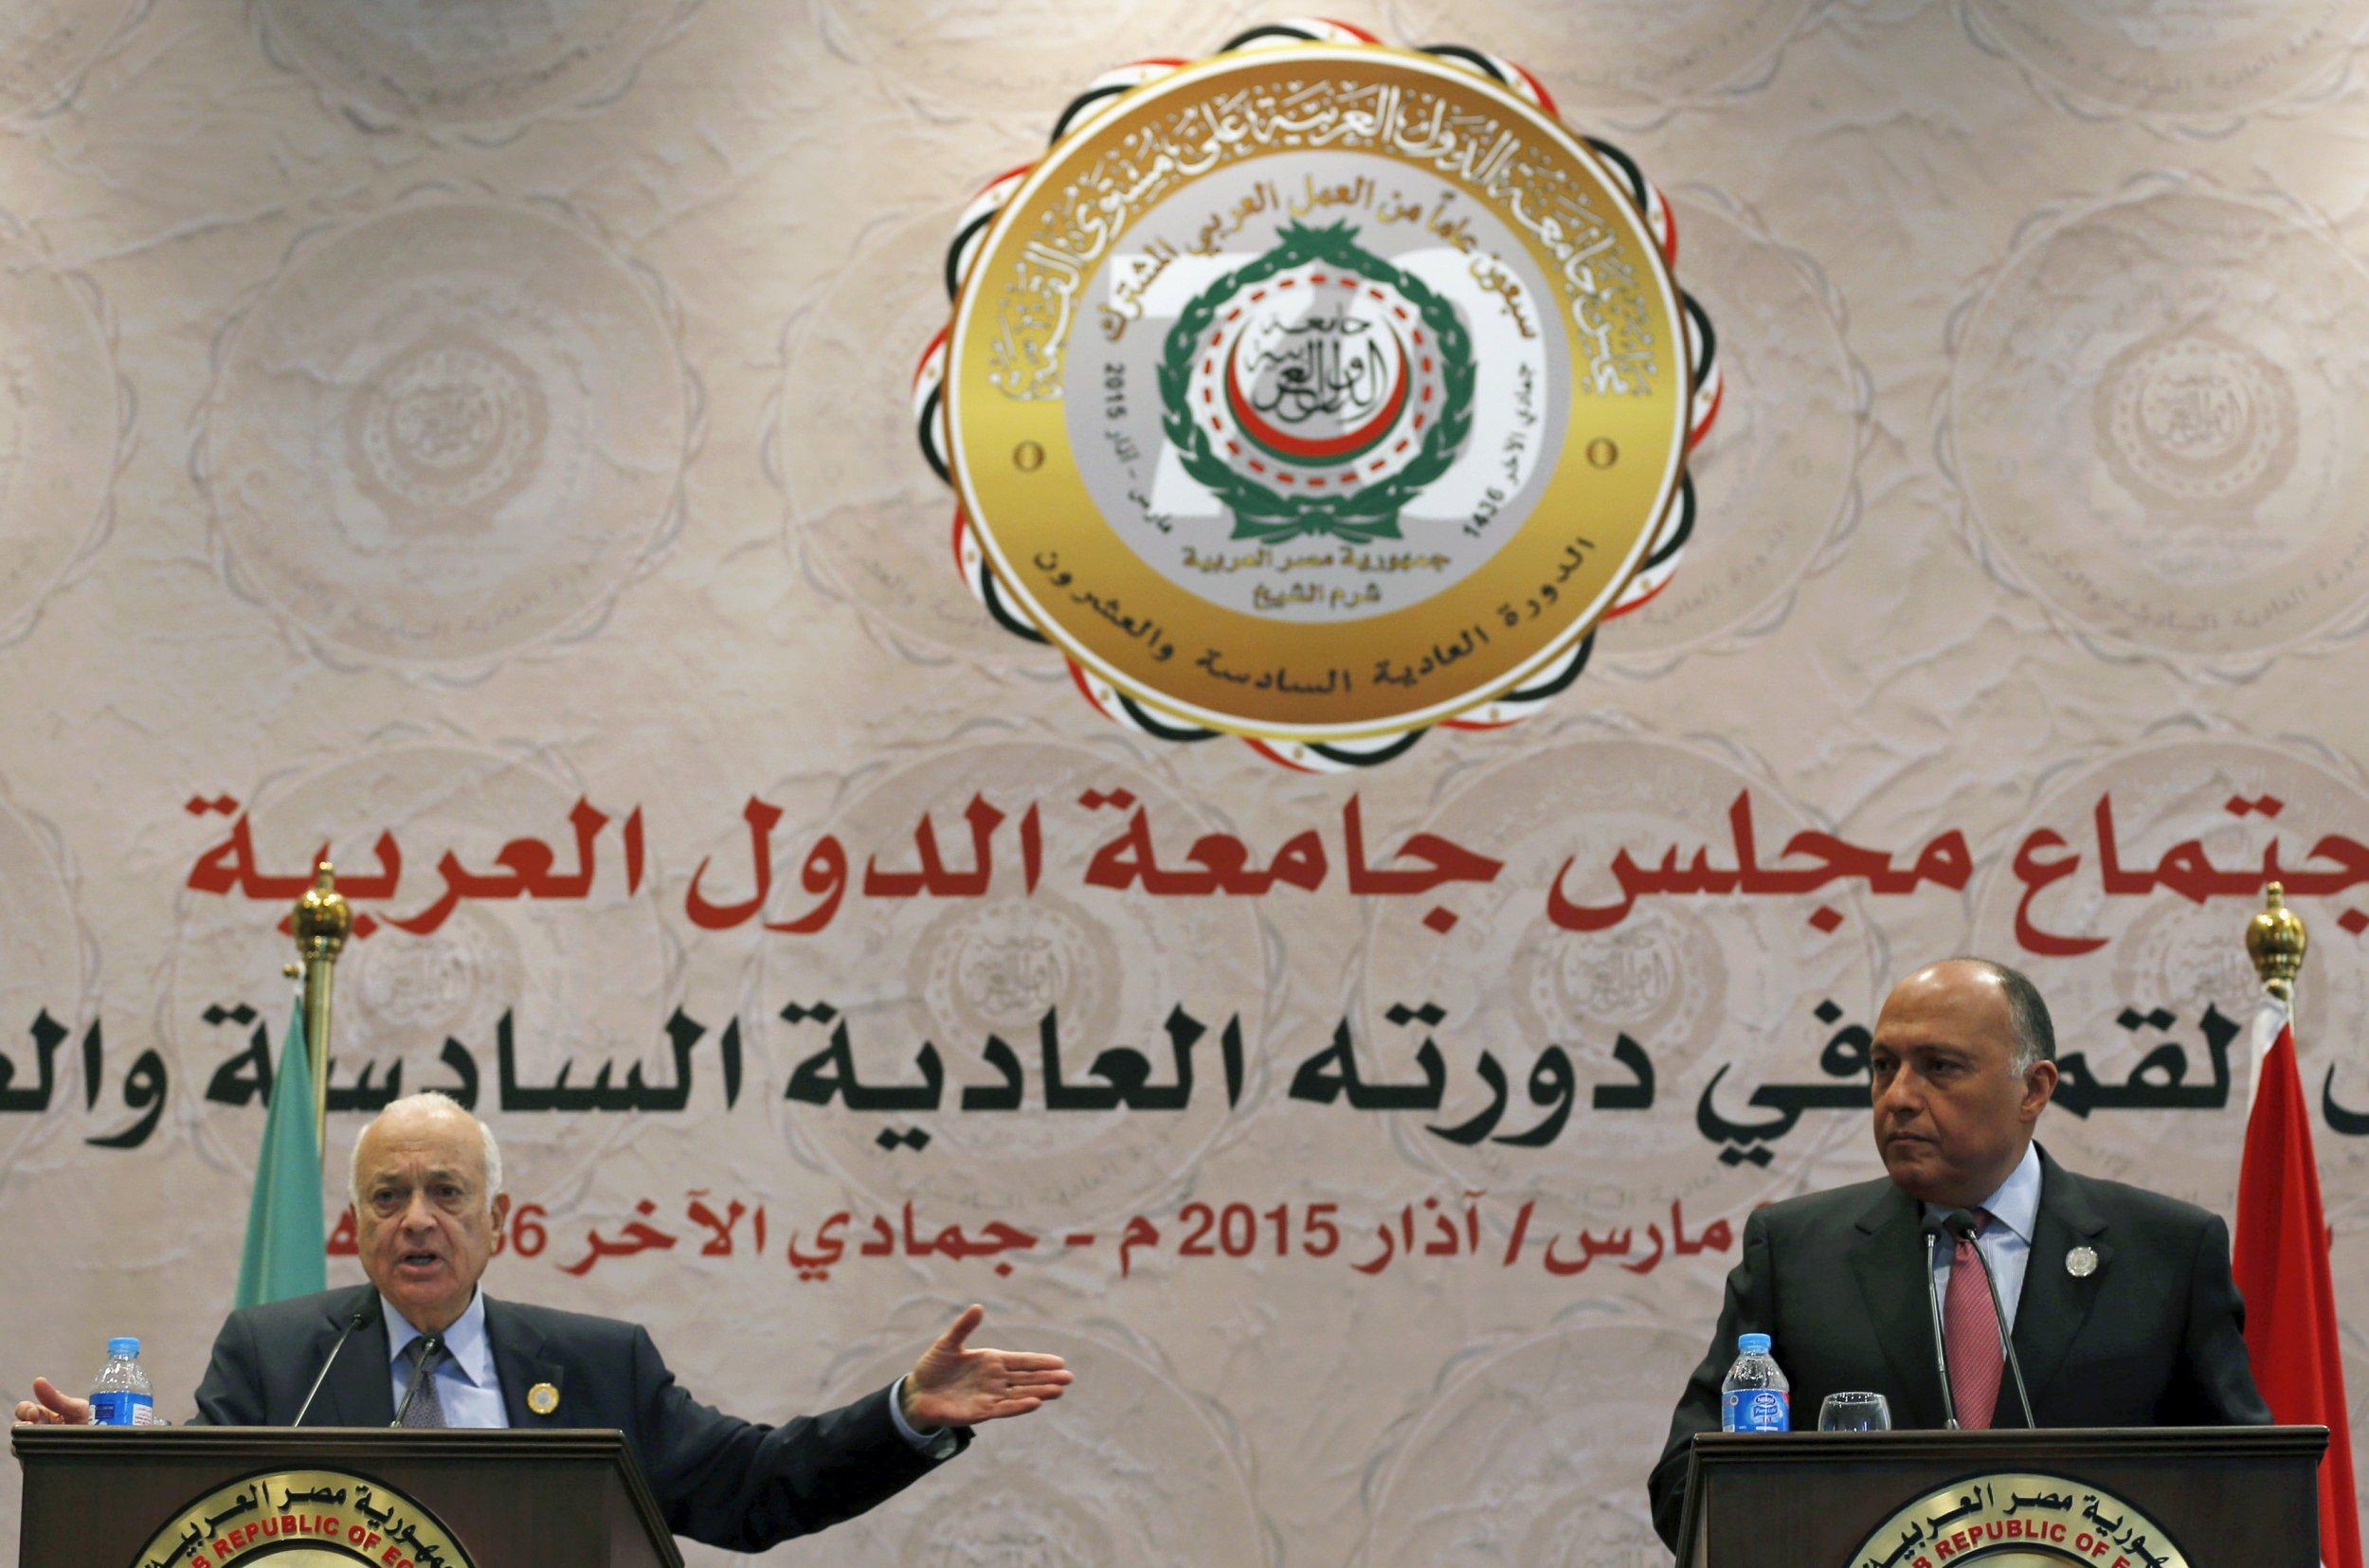 Arab_summit_0329